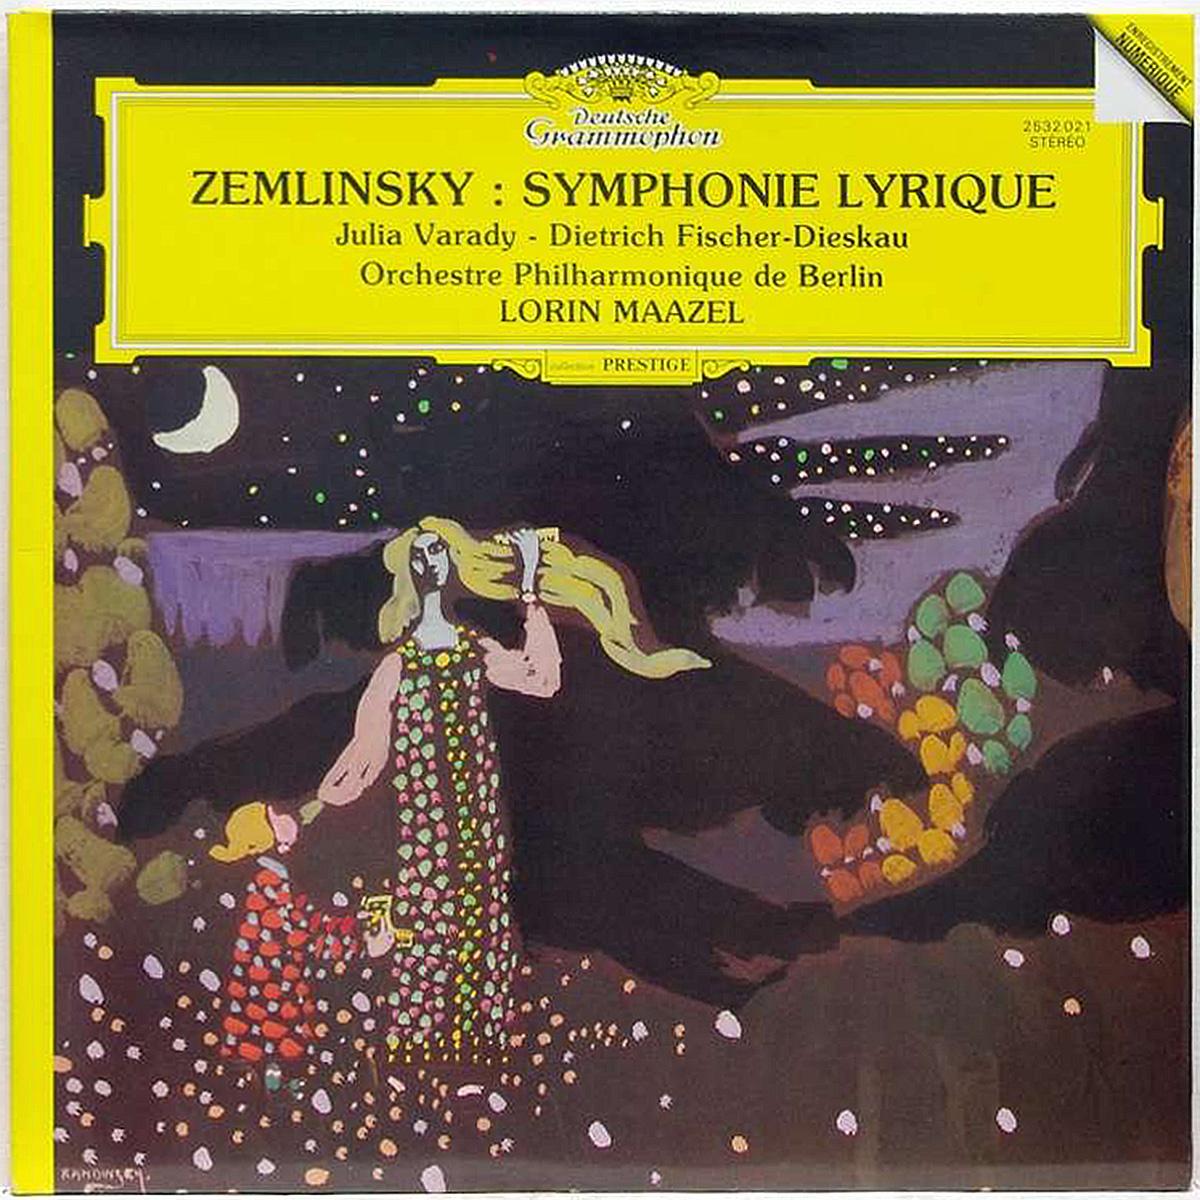 DGG 2532 021 Zemlinsky Symphonie Lyrique Maazel DGG Digital Aufnahme